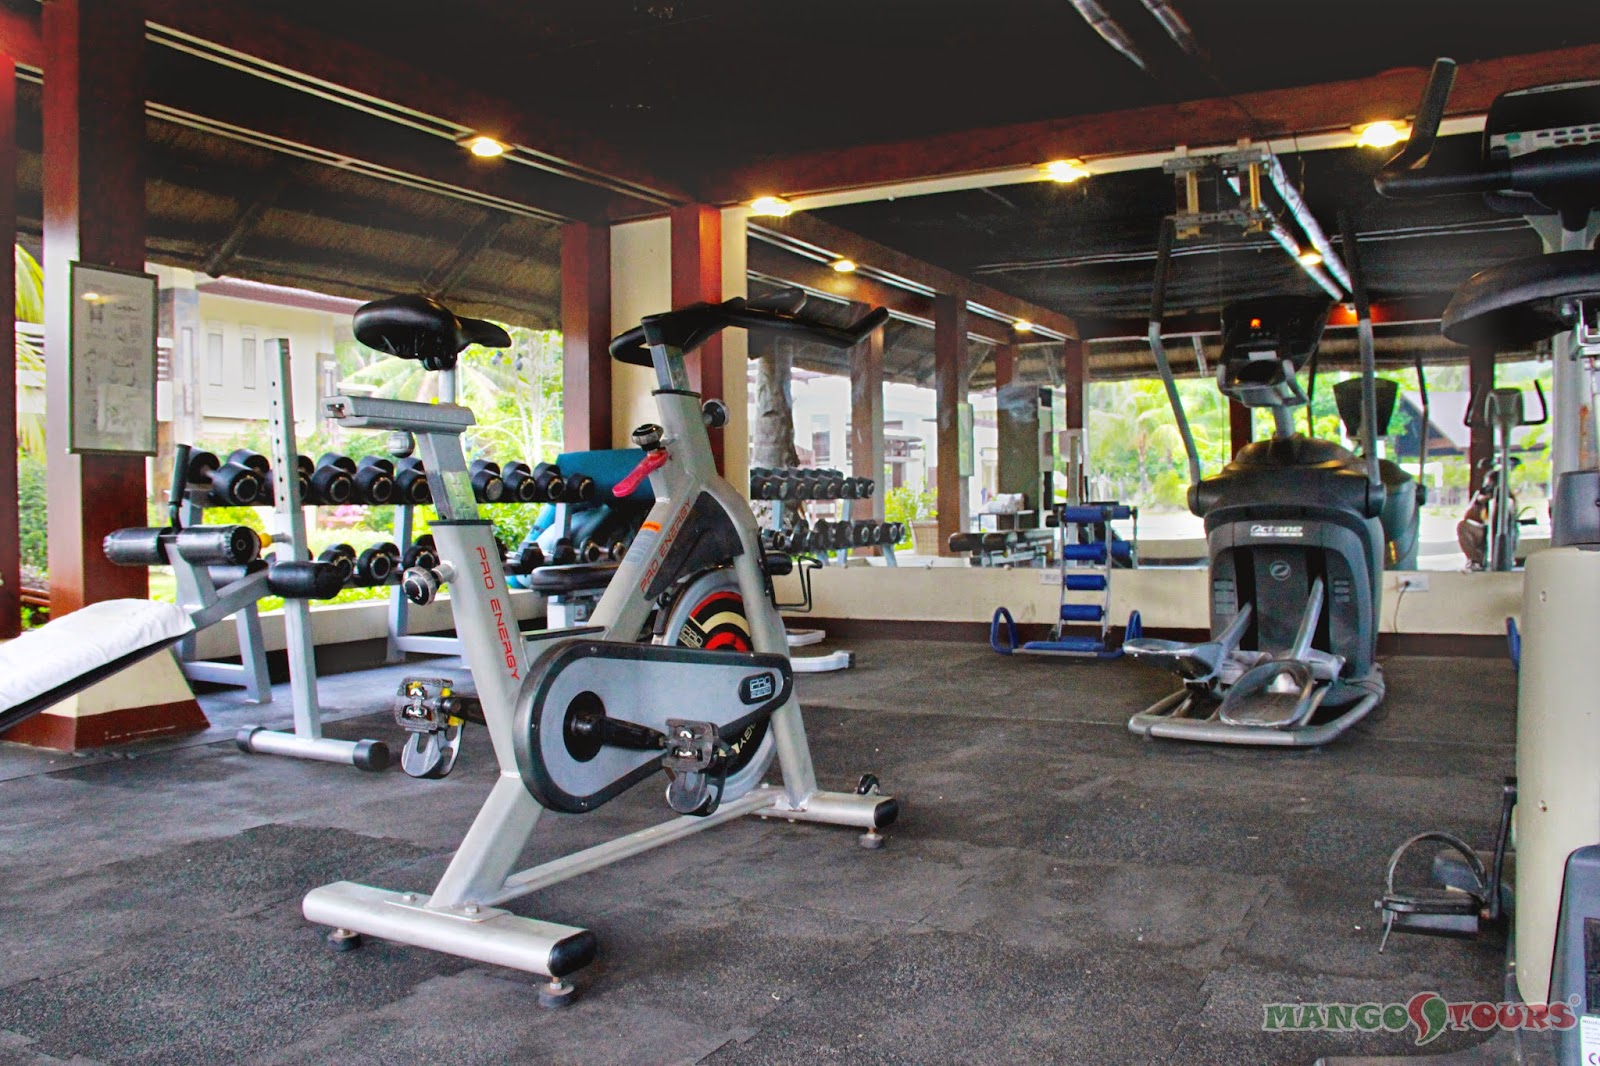 Mango Tours Philippines Puerto Princesa Palawan Sheridan Beach Resort & Spa Fitness Center